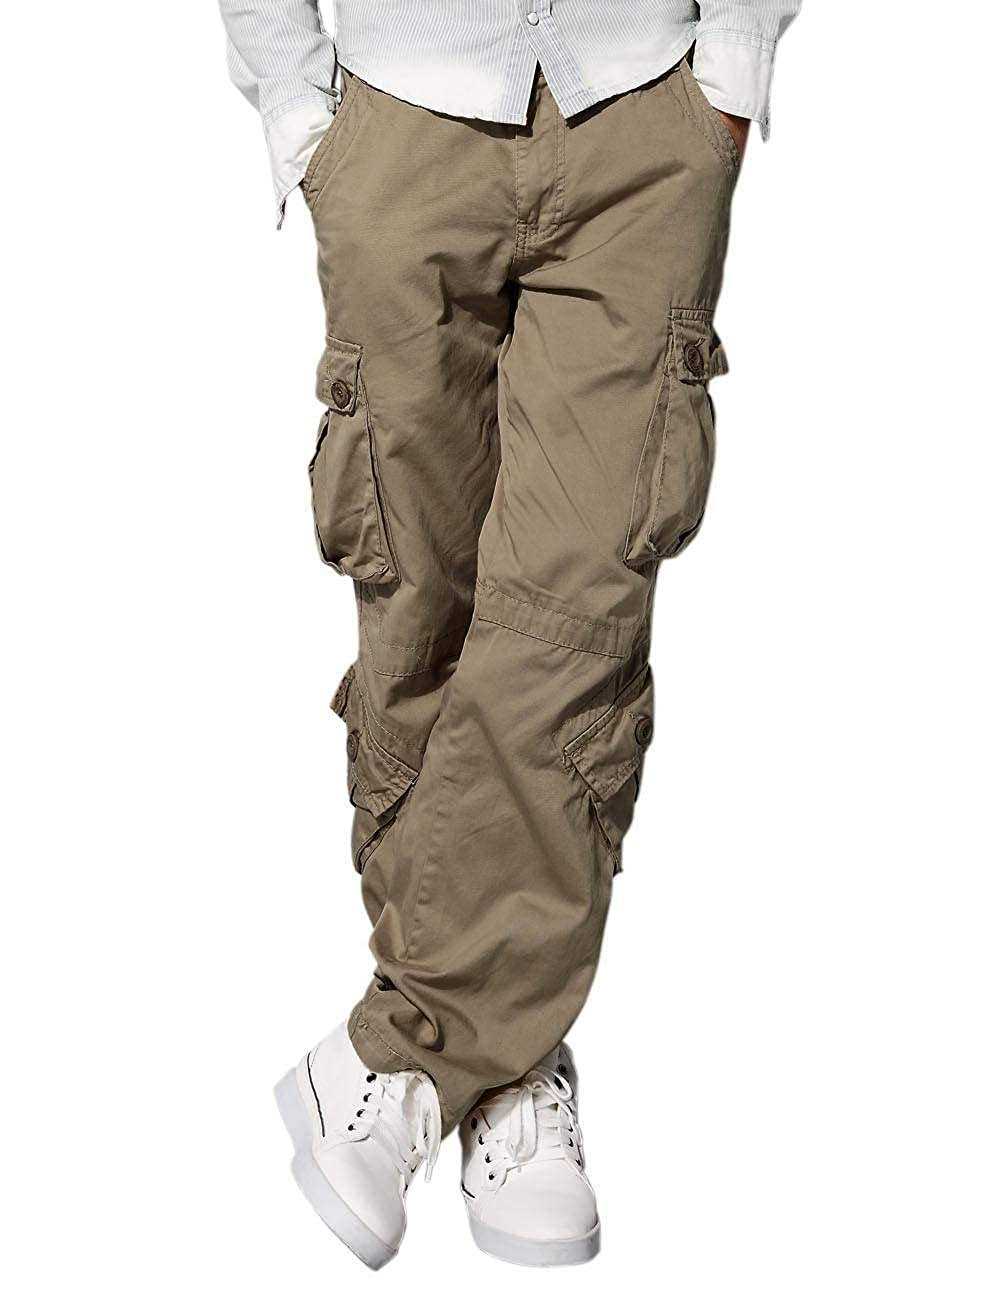 43e4c173696dc Match Men's Cargo Pant #3357